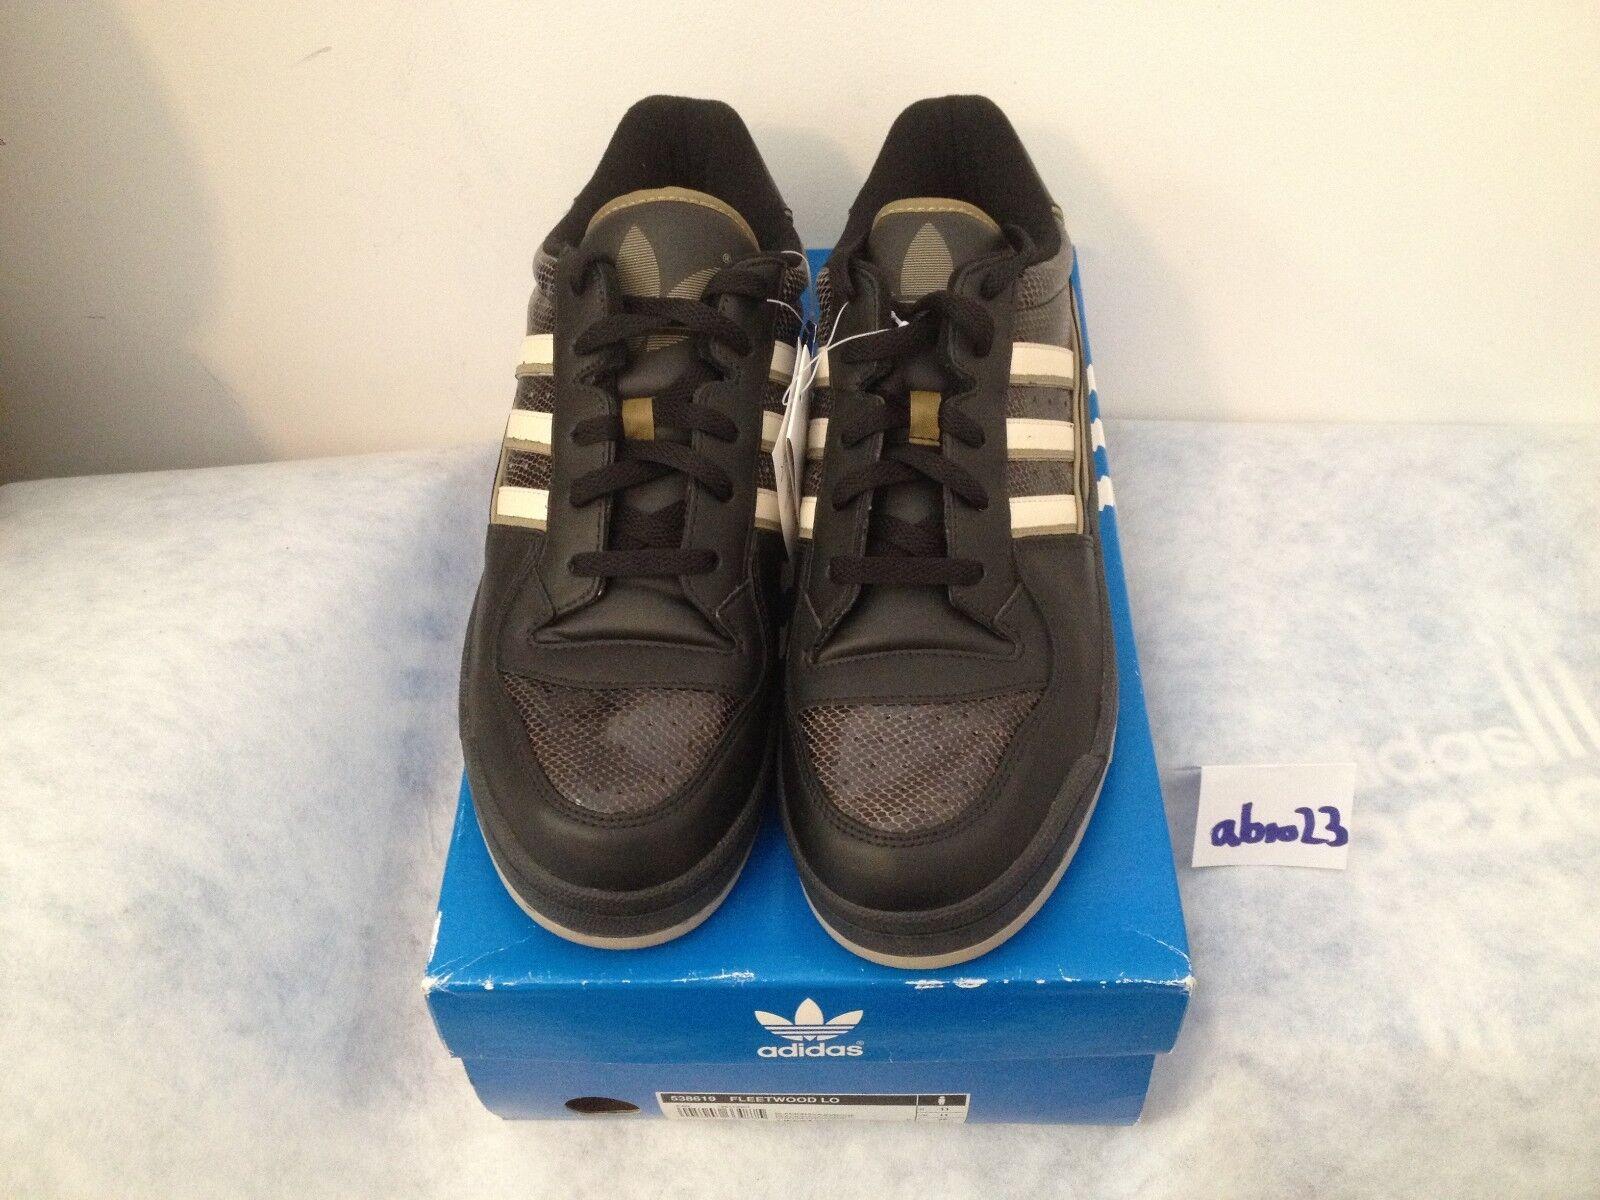 Adidas FLEETWOOD LO 46 UK 11 US 11.5 BNWT 538619 prod. 04 2004 Forum NEU NEW